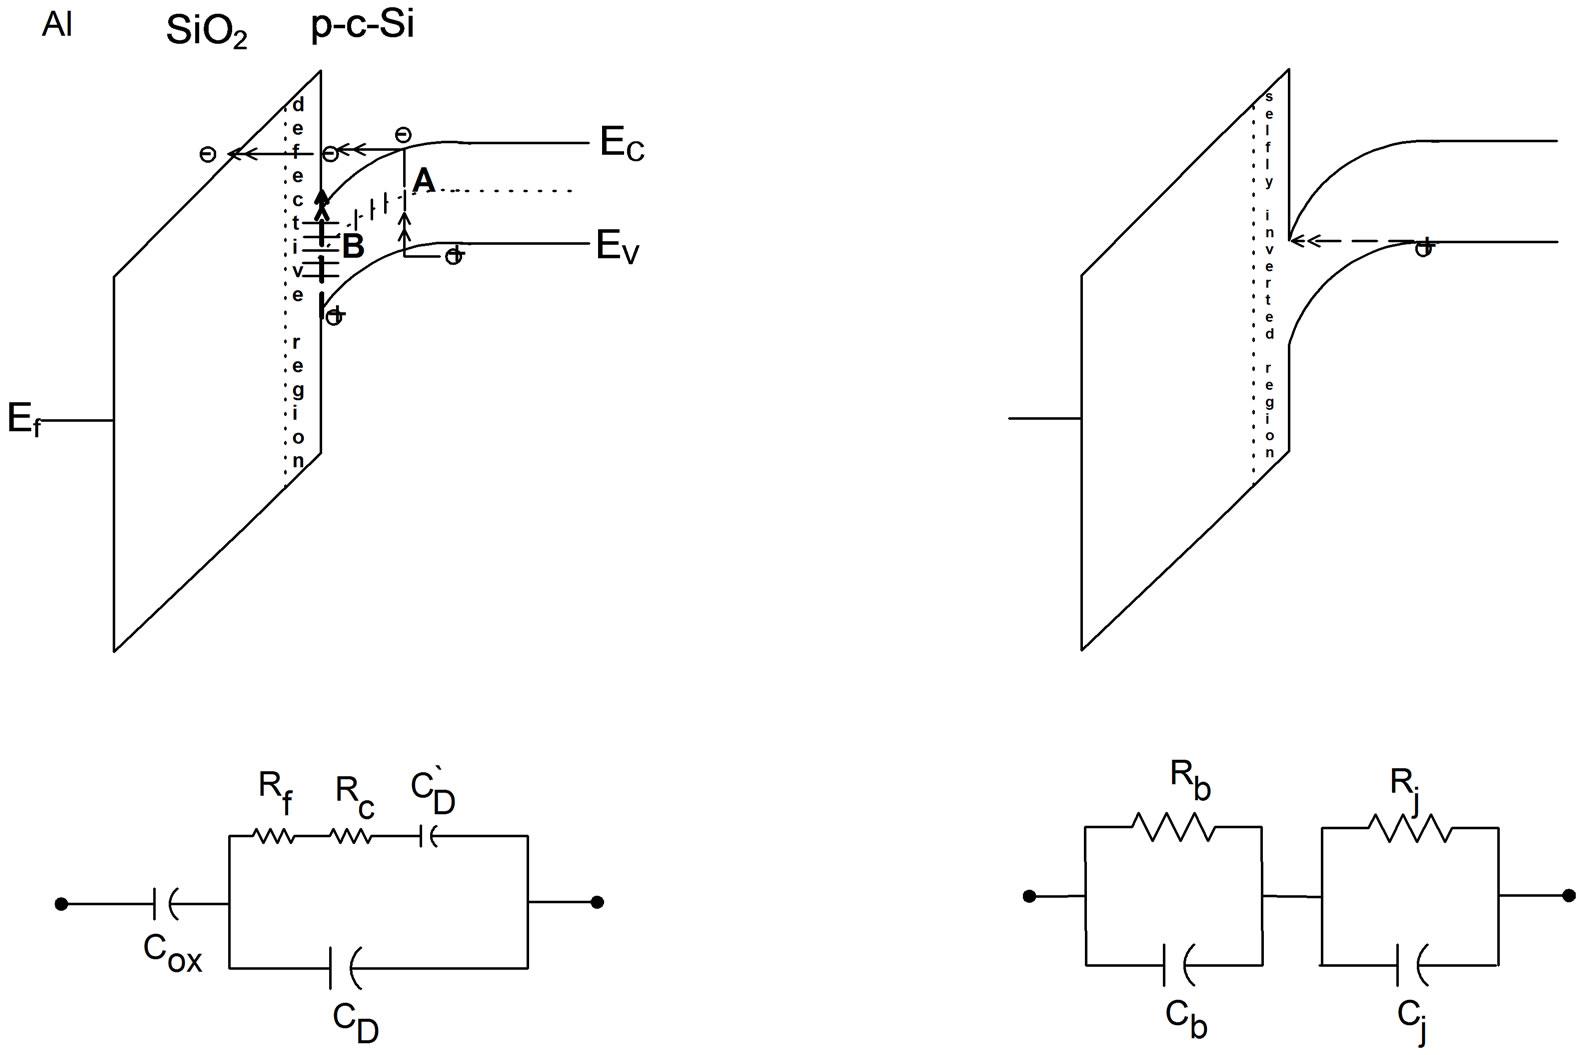 hight resolution of kawasaki zx7 cdi wiring diagram yamaha fz1 wiring diagram 5 pin wiring diagram cdi ignition wiring